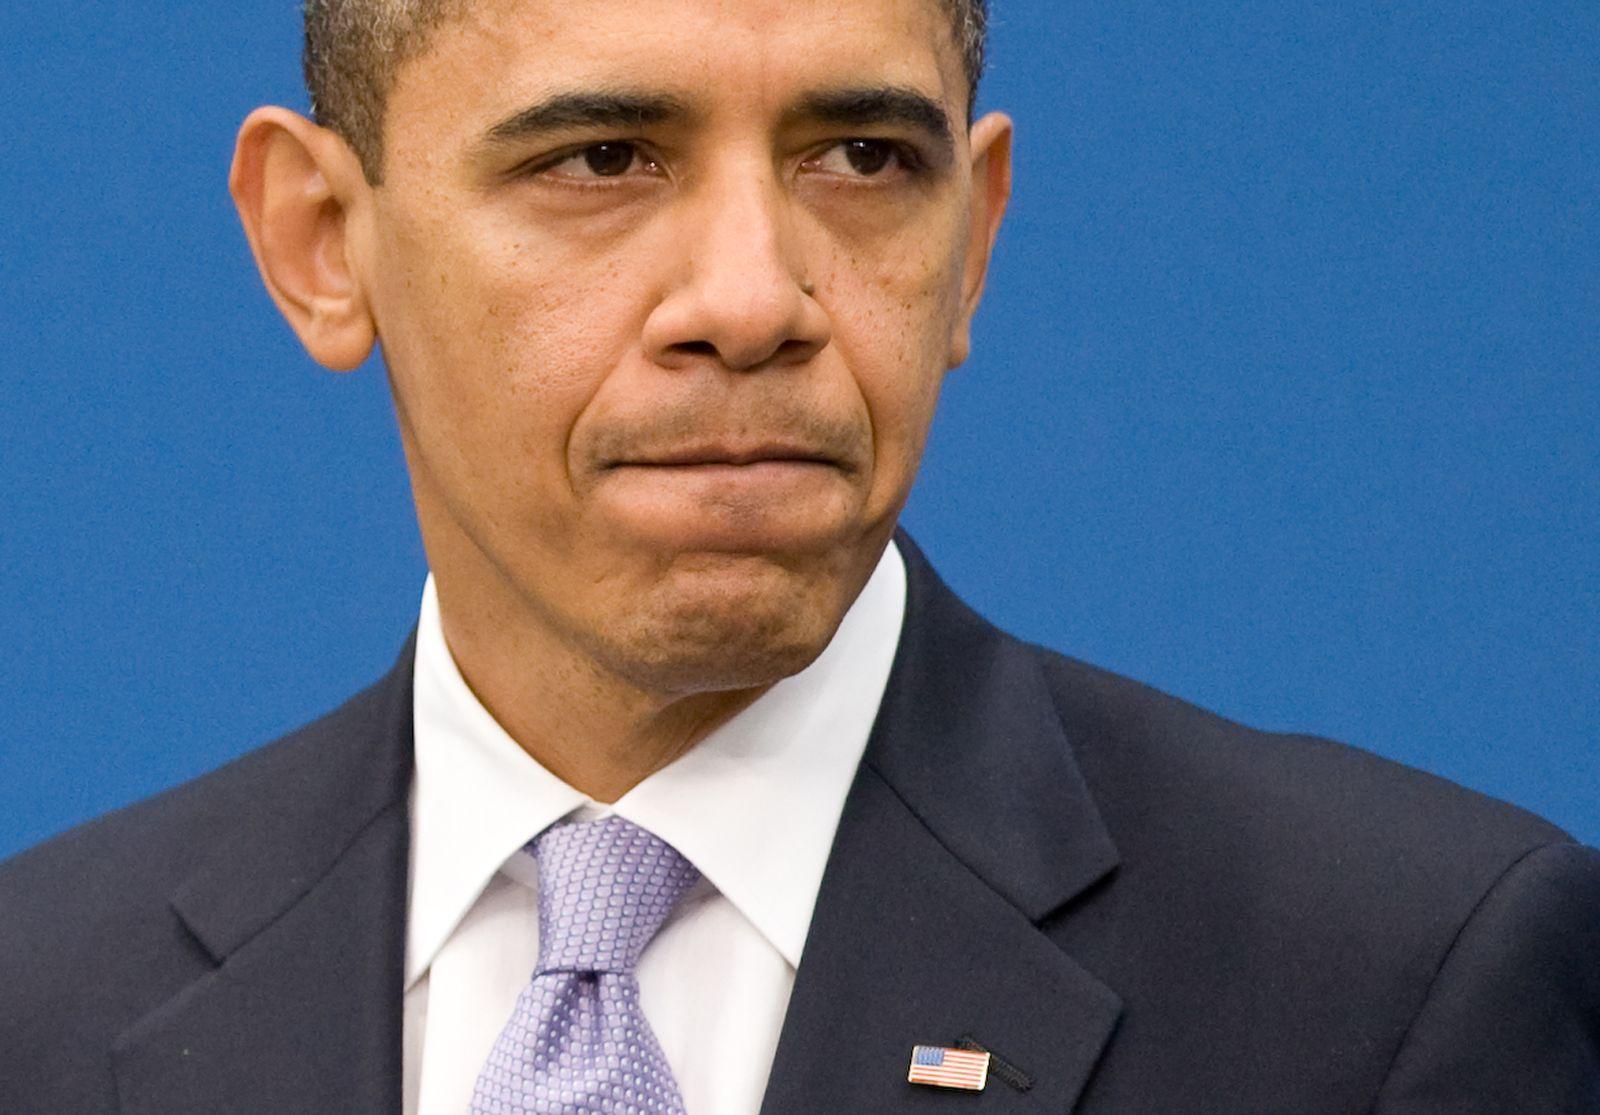 Obama Klimagipfel